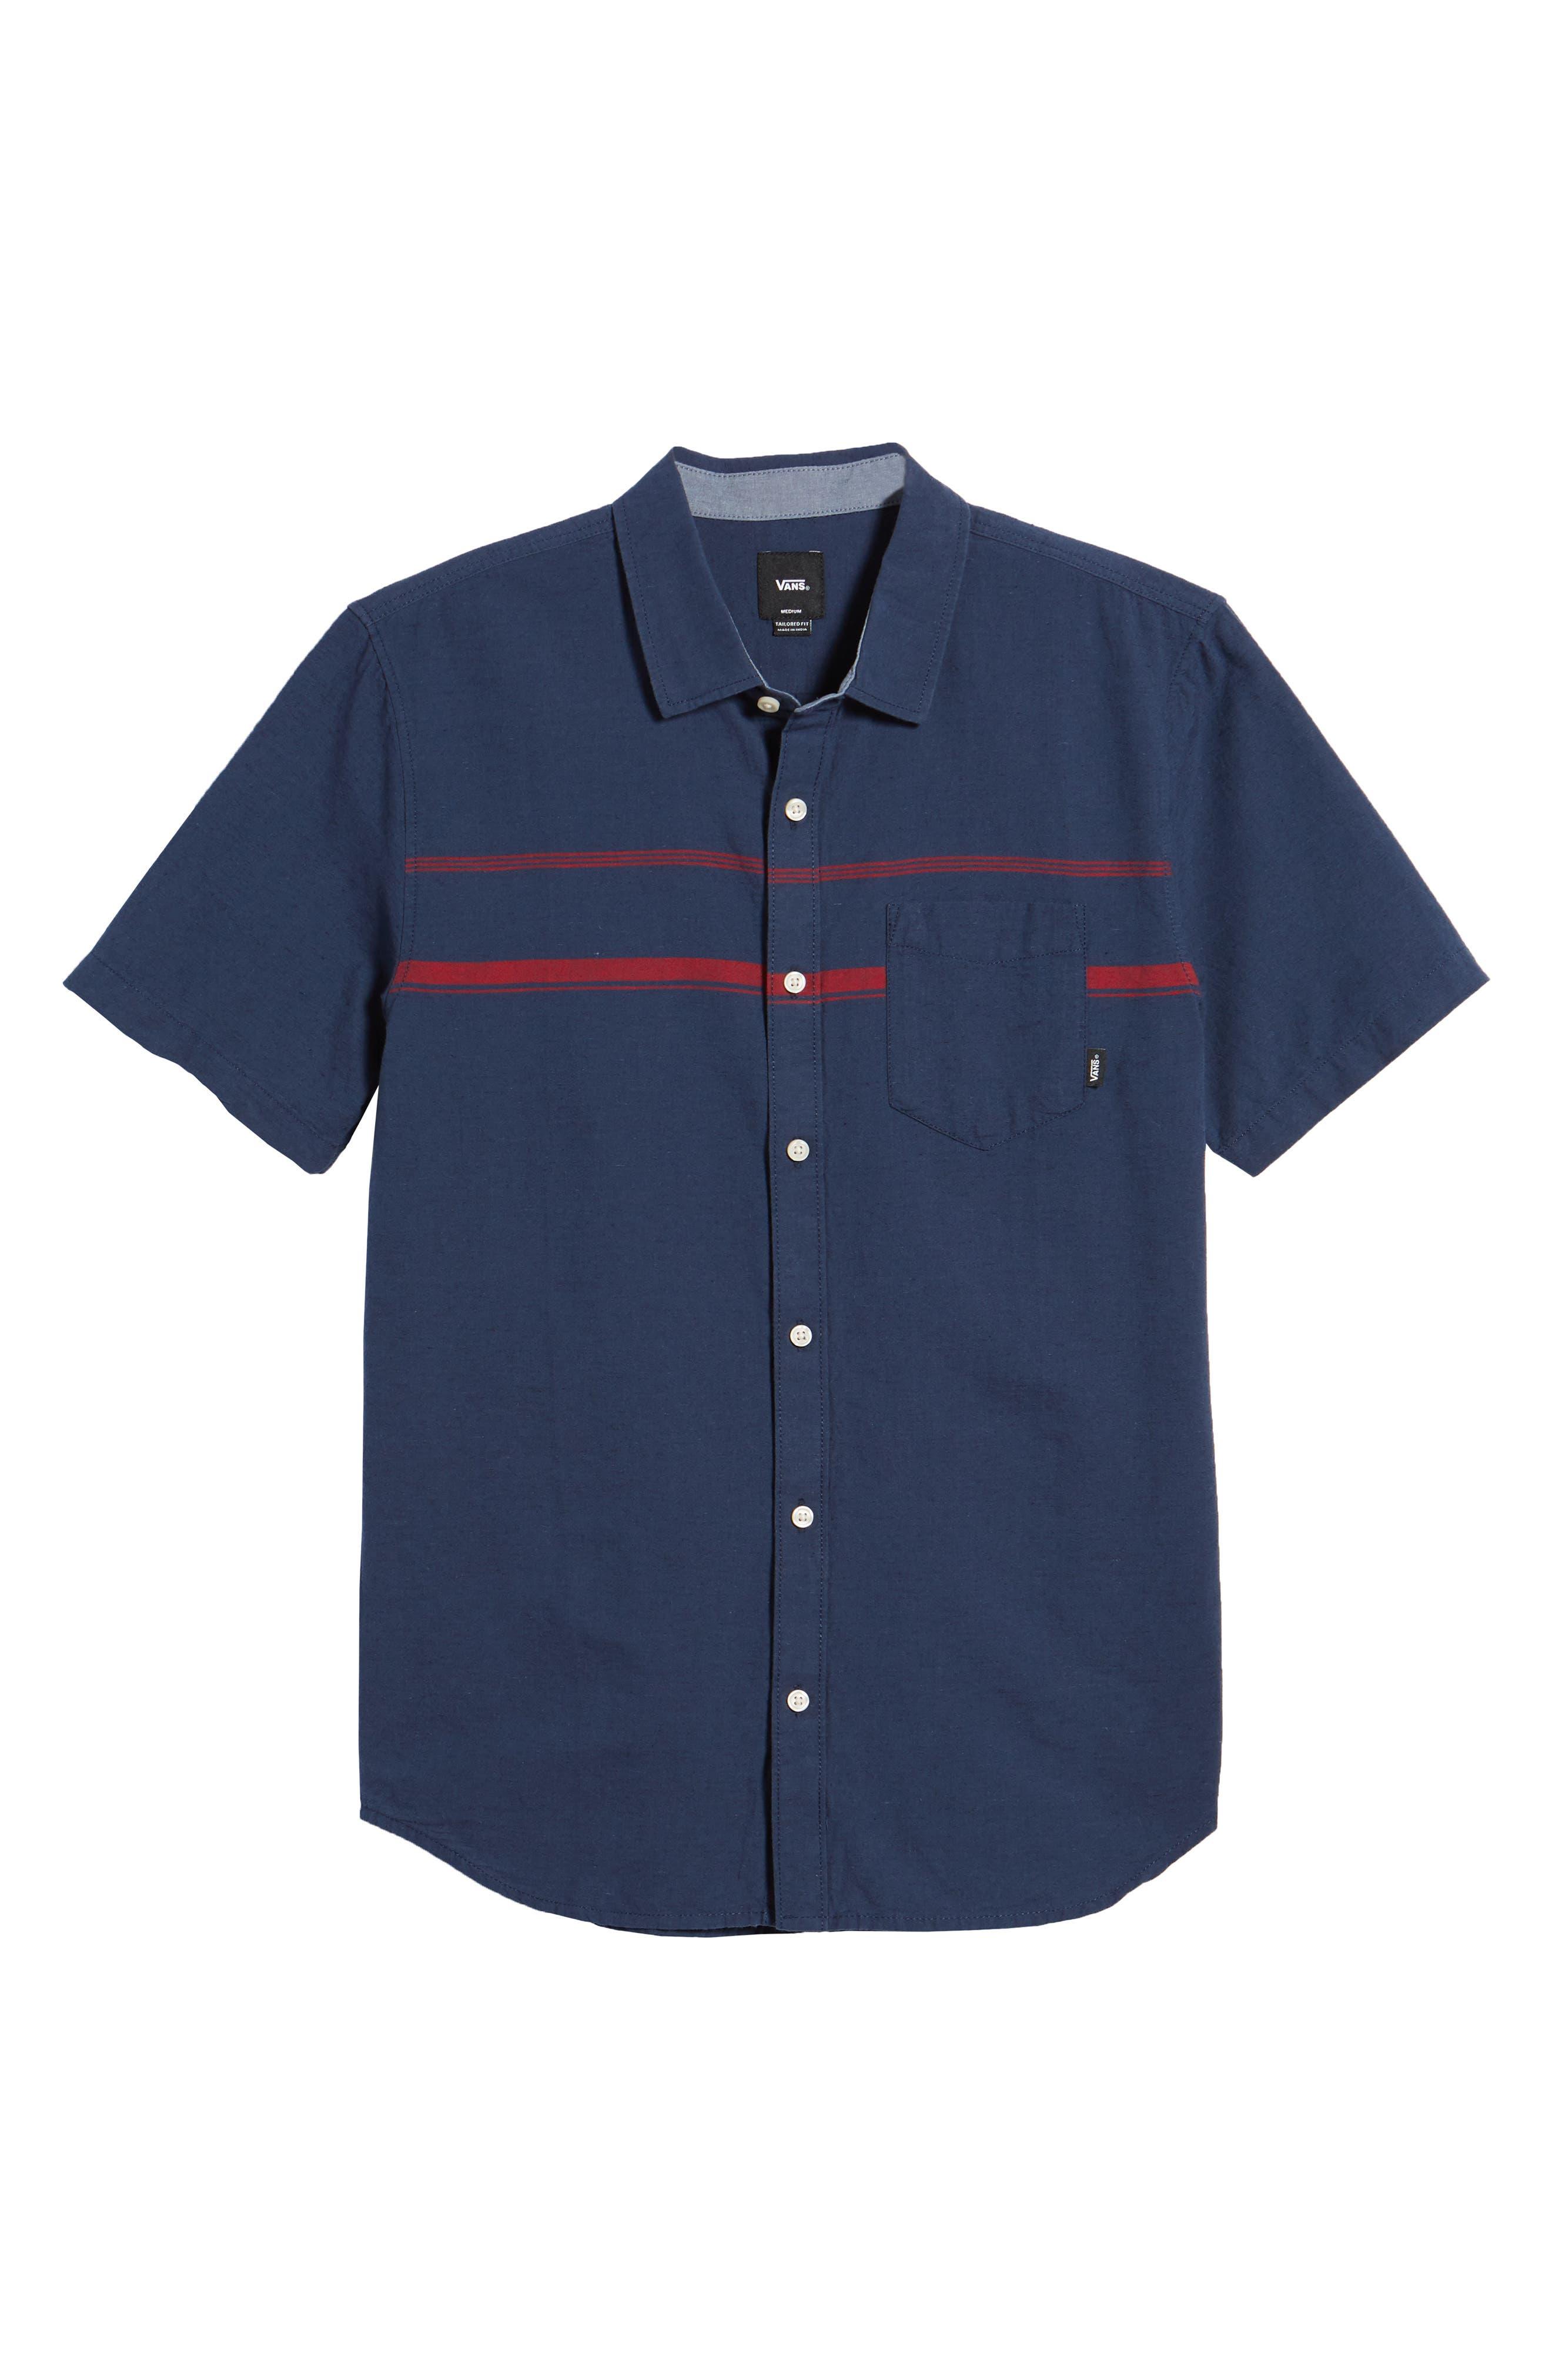 Thurber Short Sleeve Shirt,                             Alternate thumbnail 6, color,                             401